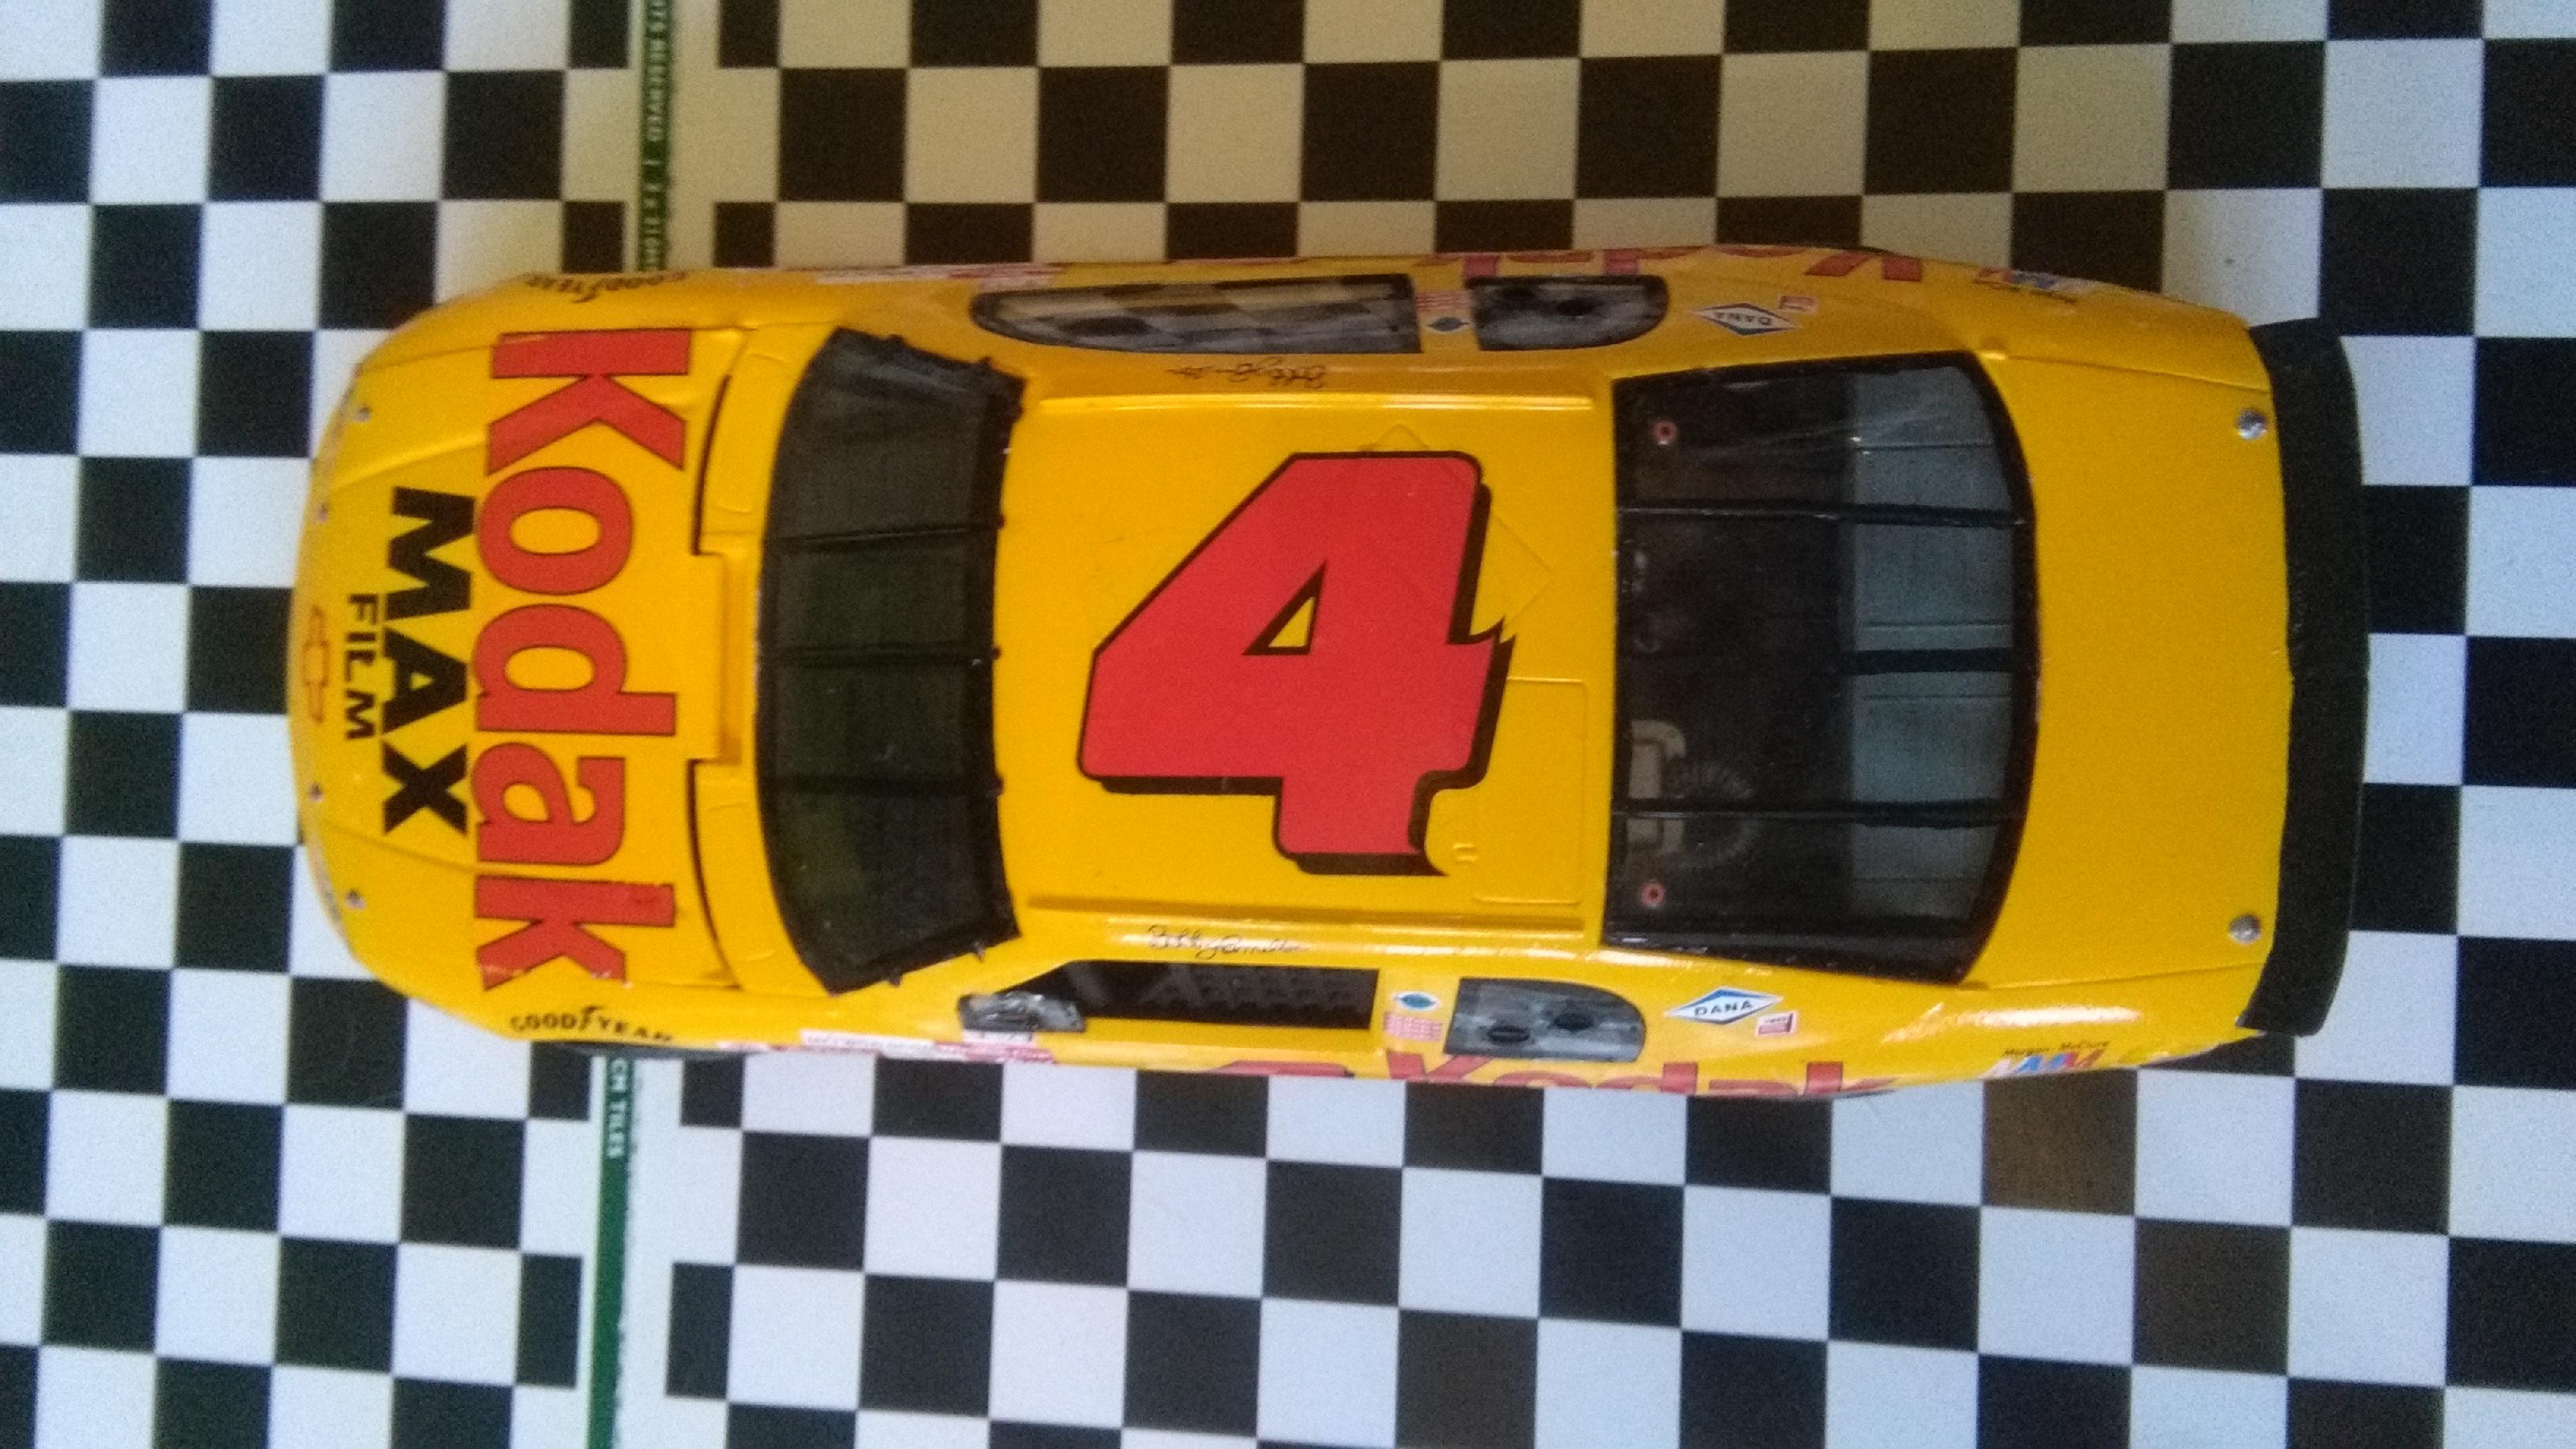 Chevy Monte-Carlo 1998 #4 Bobby Hamilton Kodak  503496IMG20170311174550